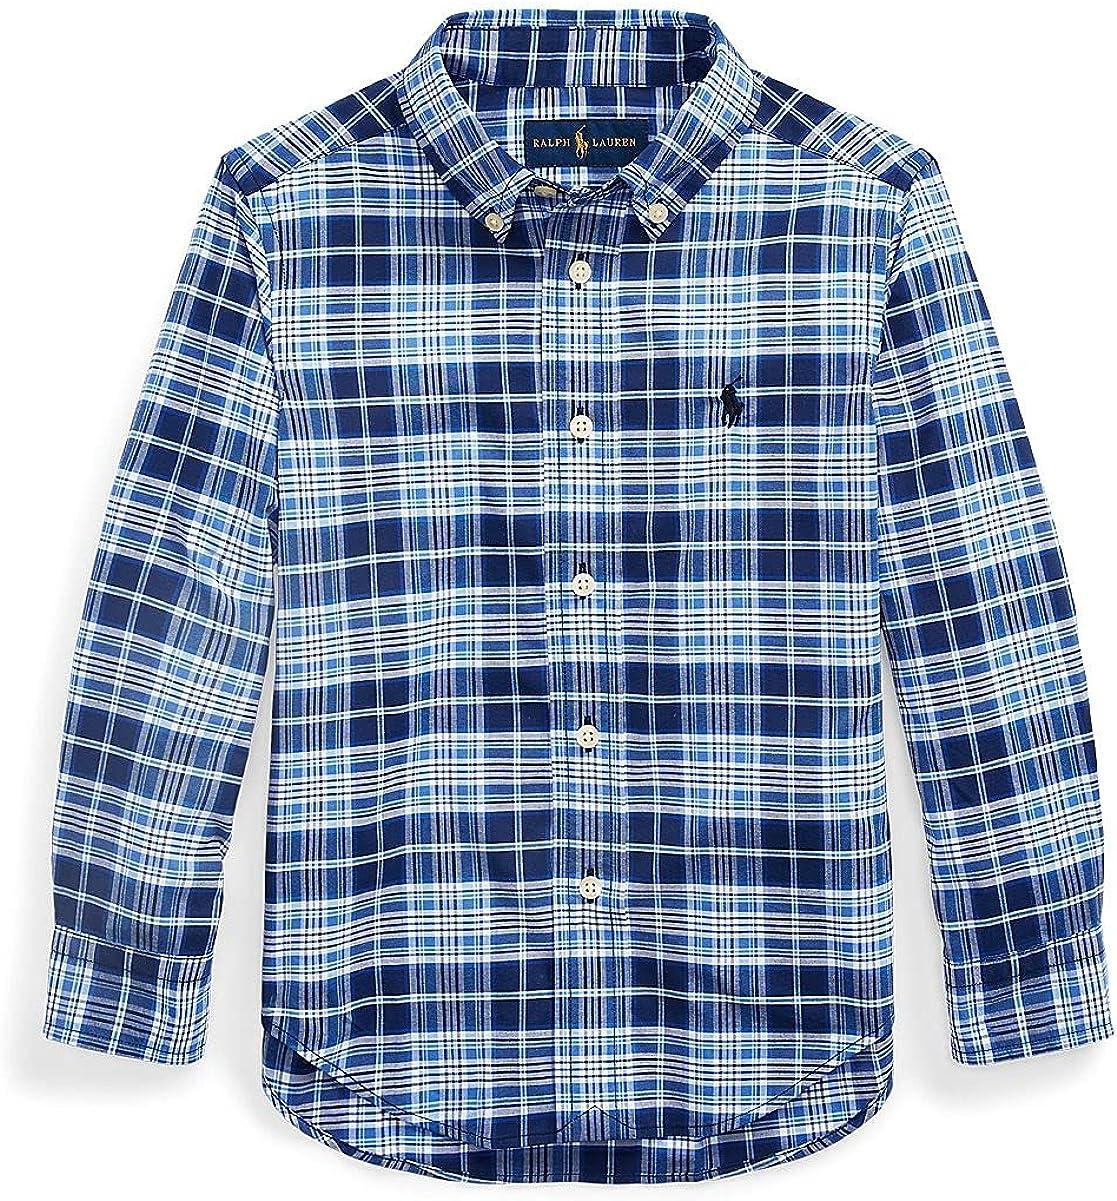 Polo Ralph Lauren Blue/White Multi Boys Plaid Performance Poplin Shirt, US